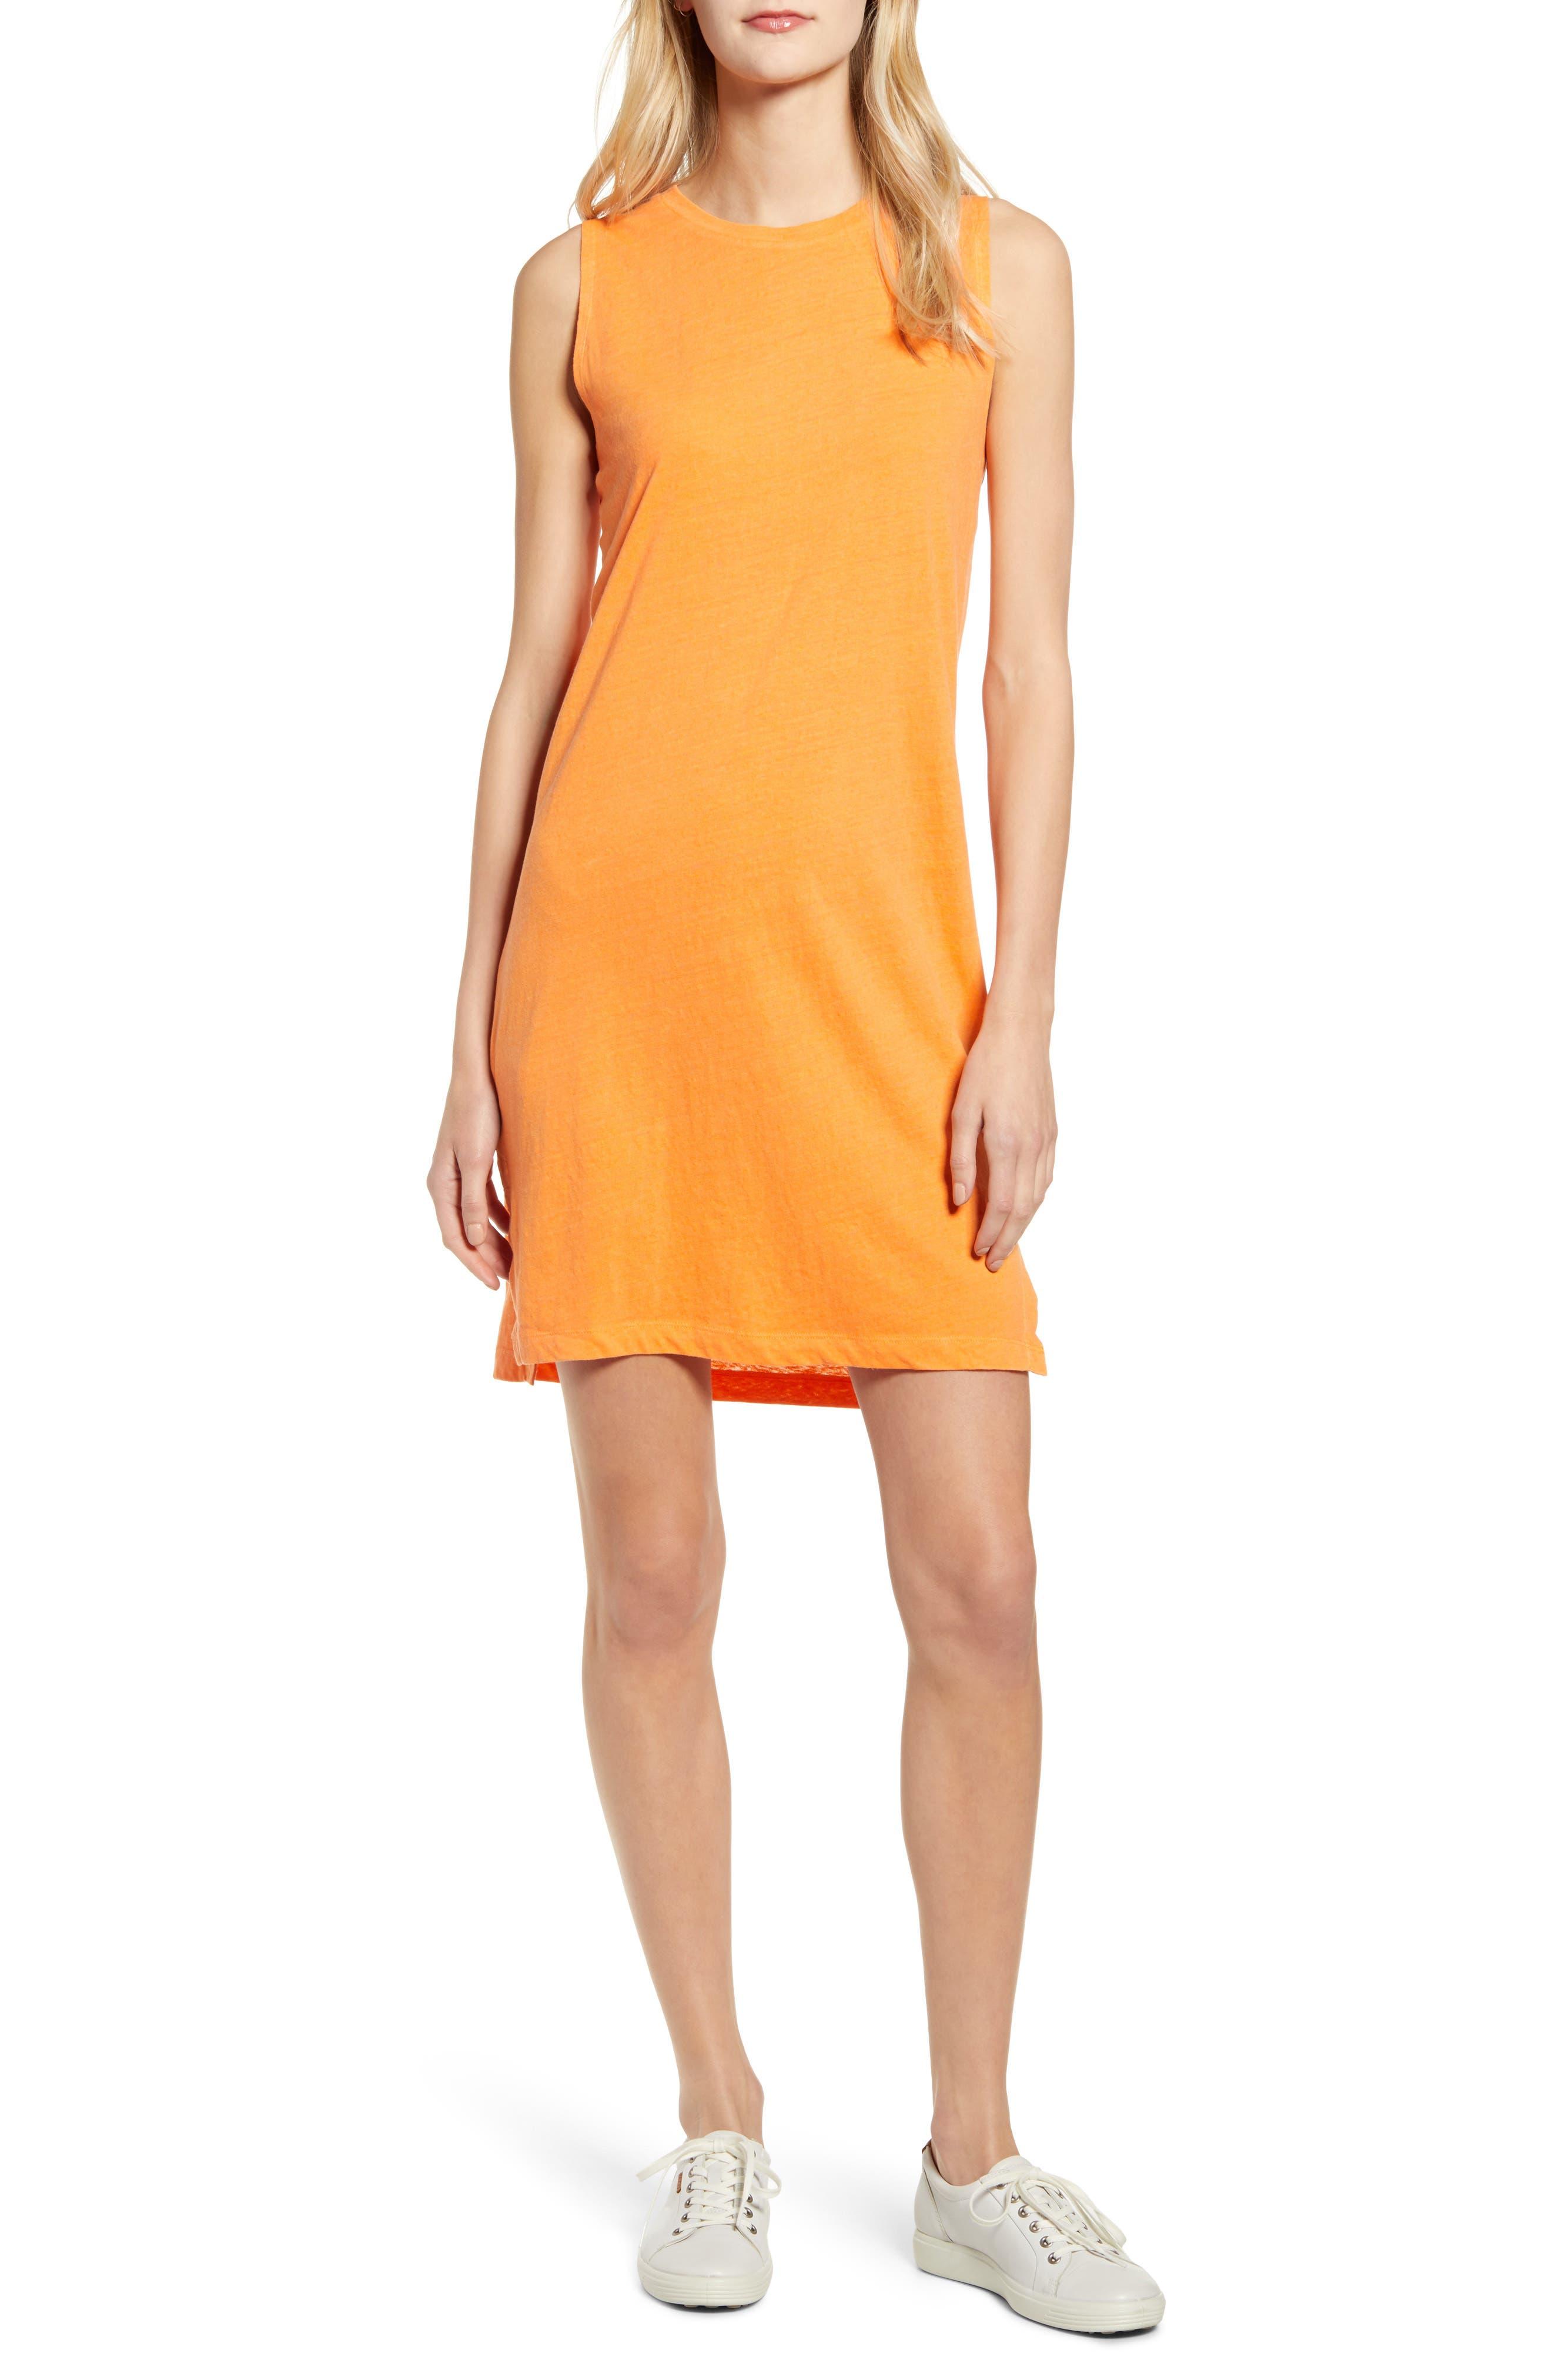 Lou & Grey Softserve Slub Tank Dress, Orange